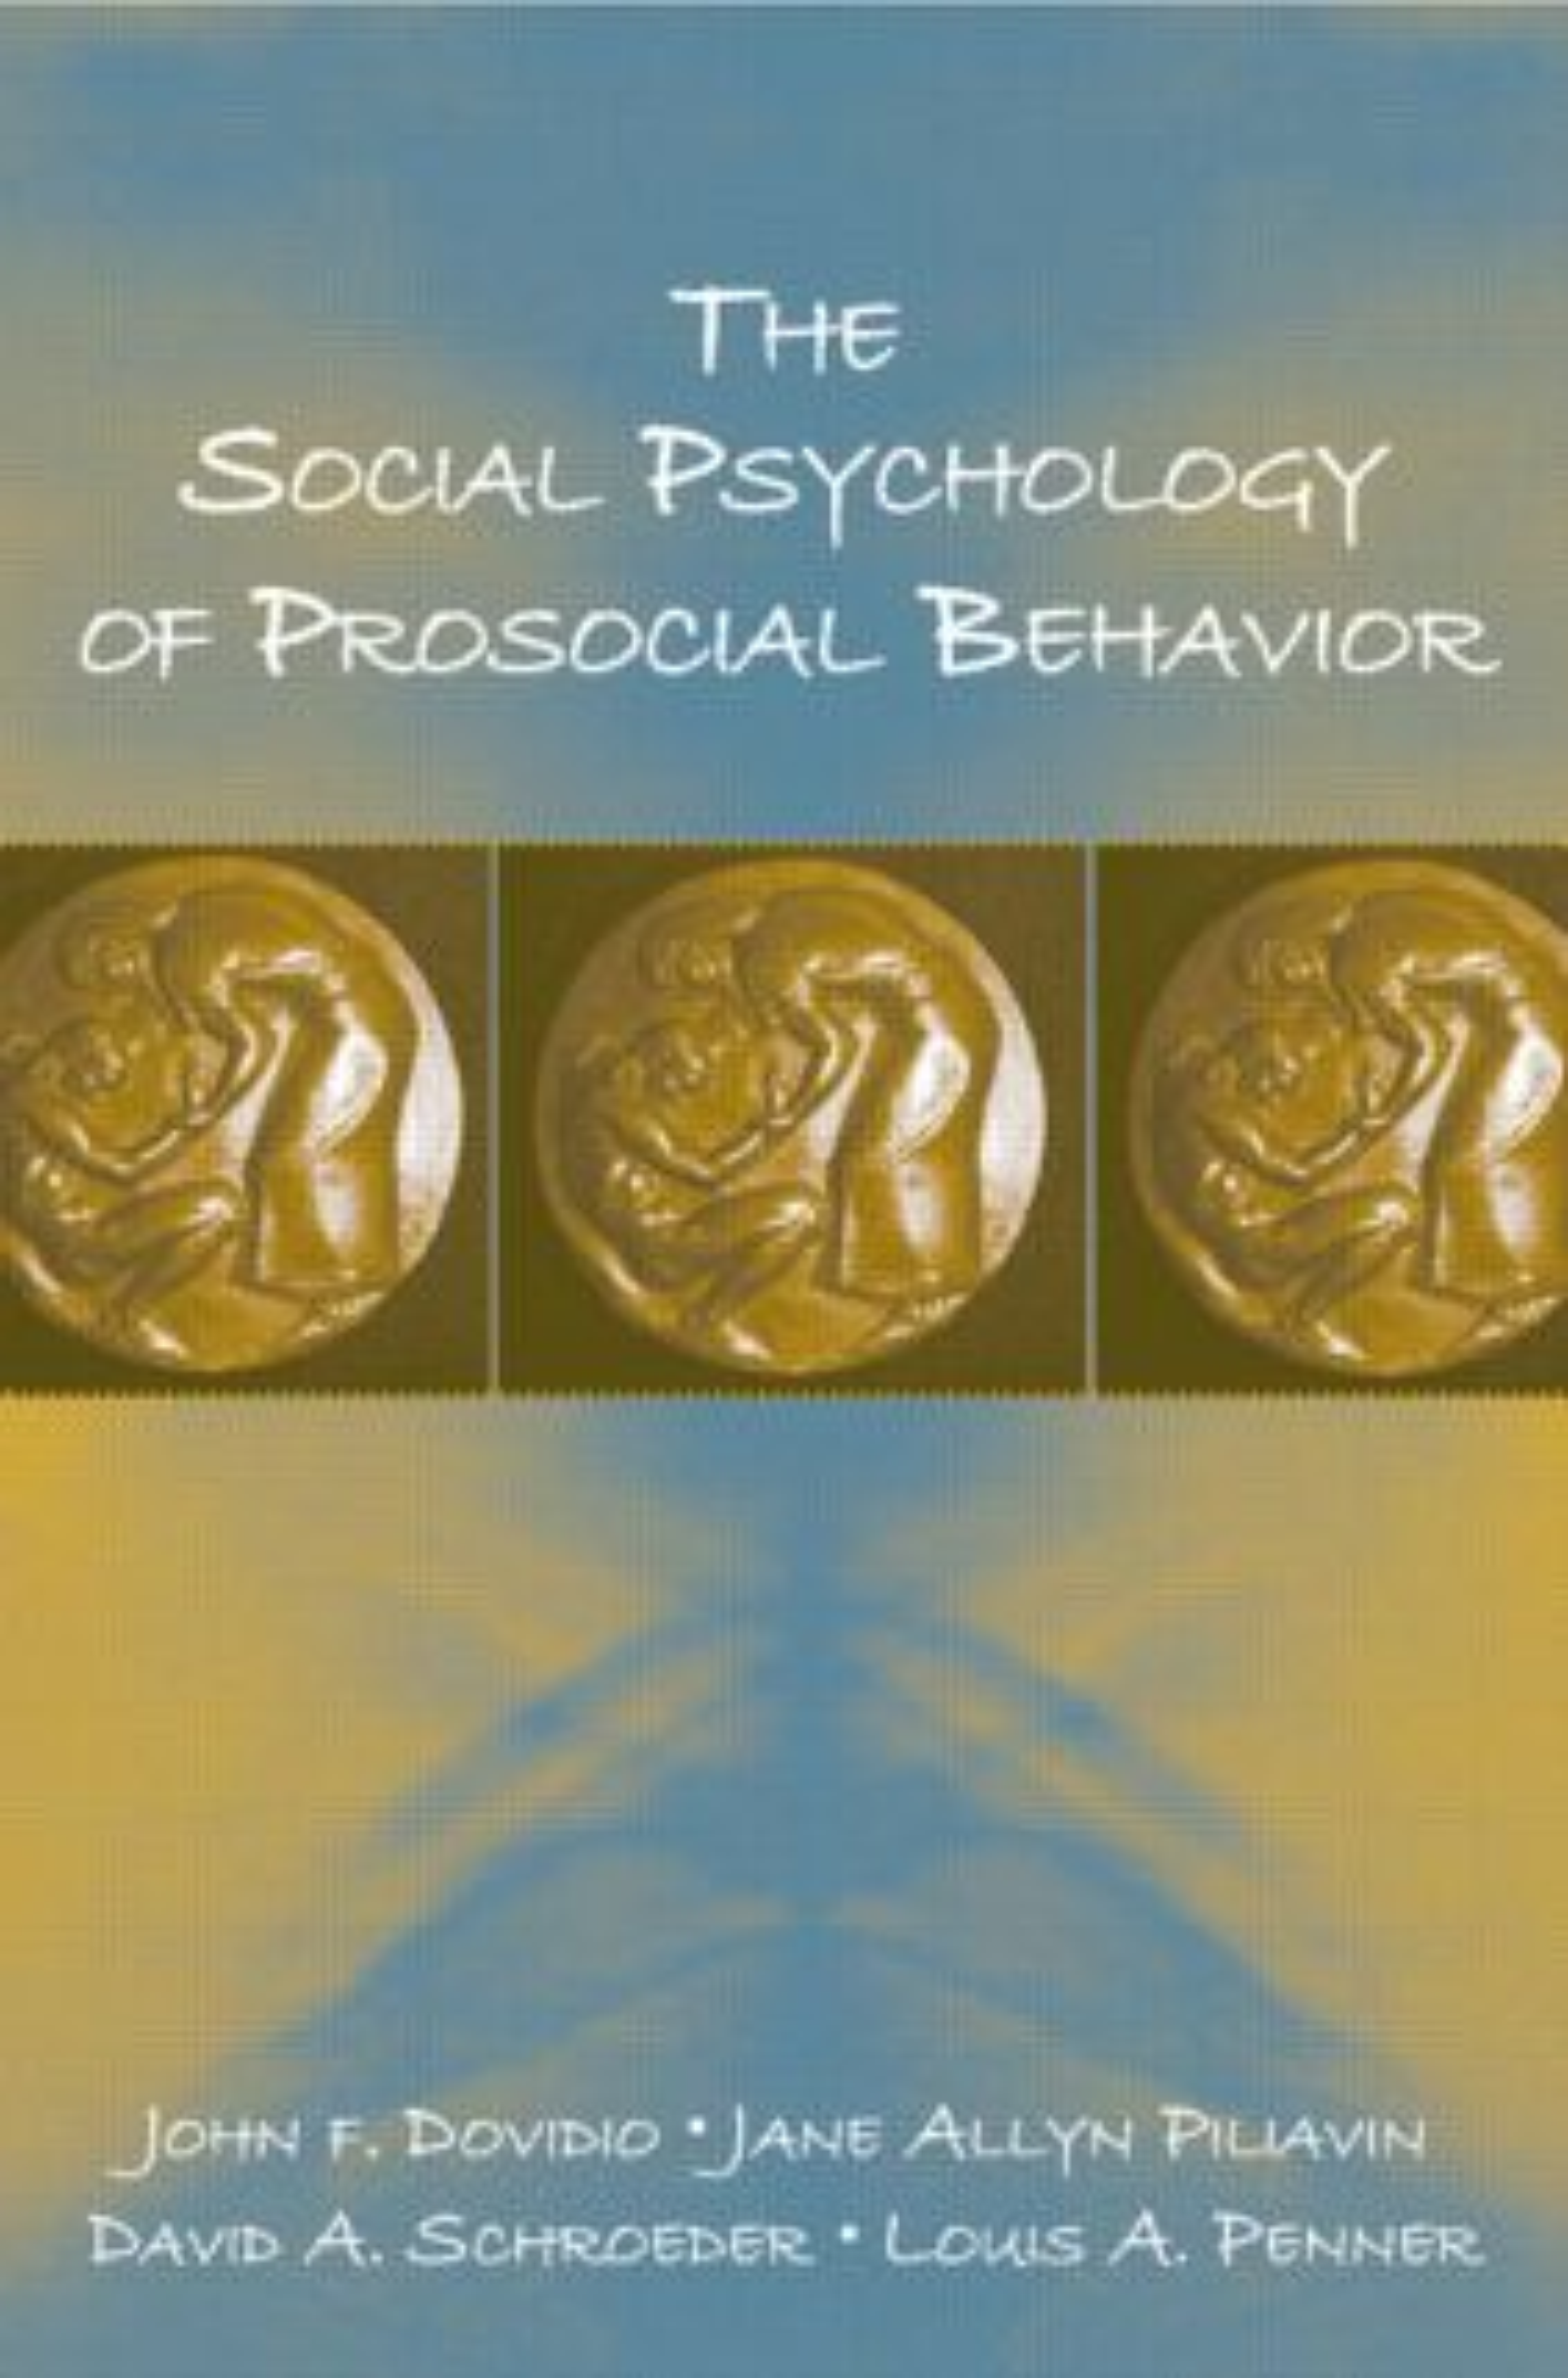 The Social Psychology of Prosocial Behavior: 1st Edition (Hardback) book cover